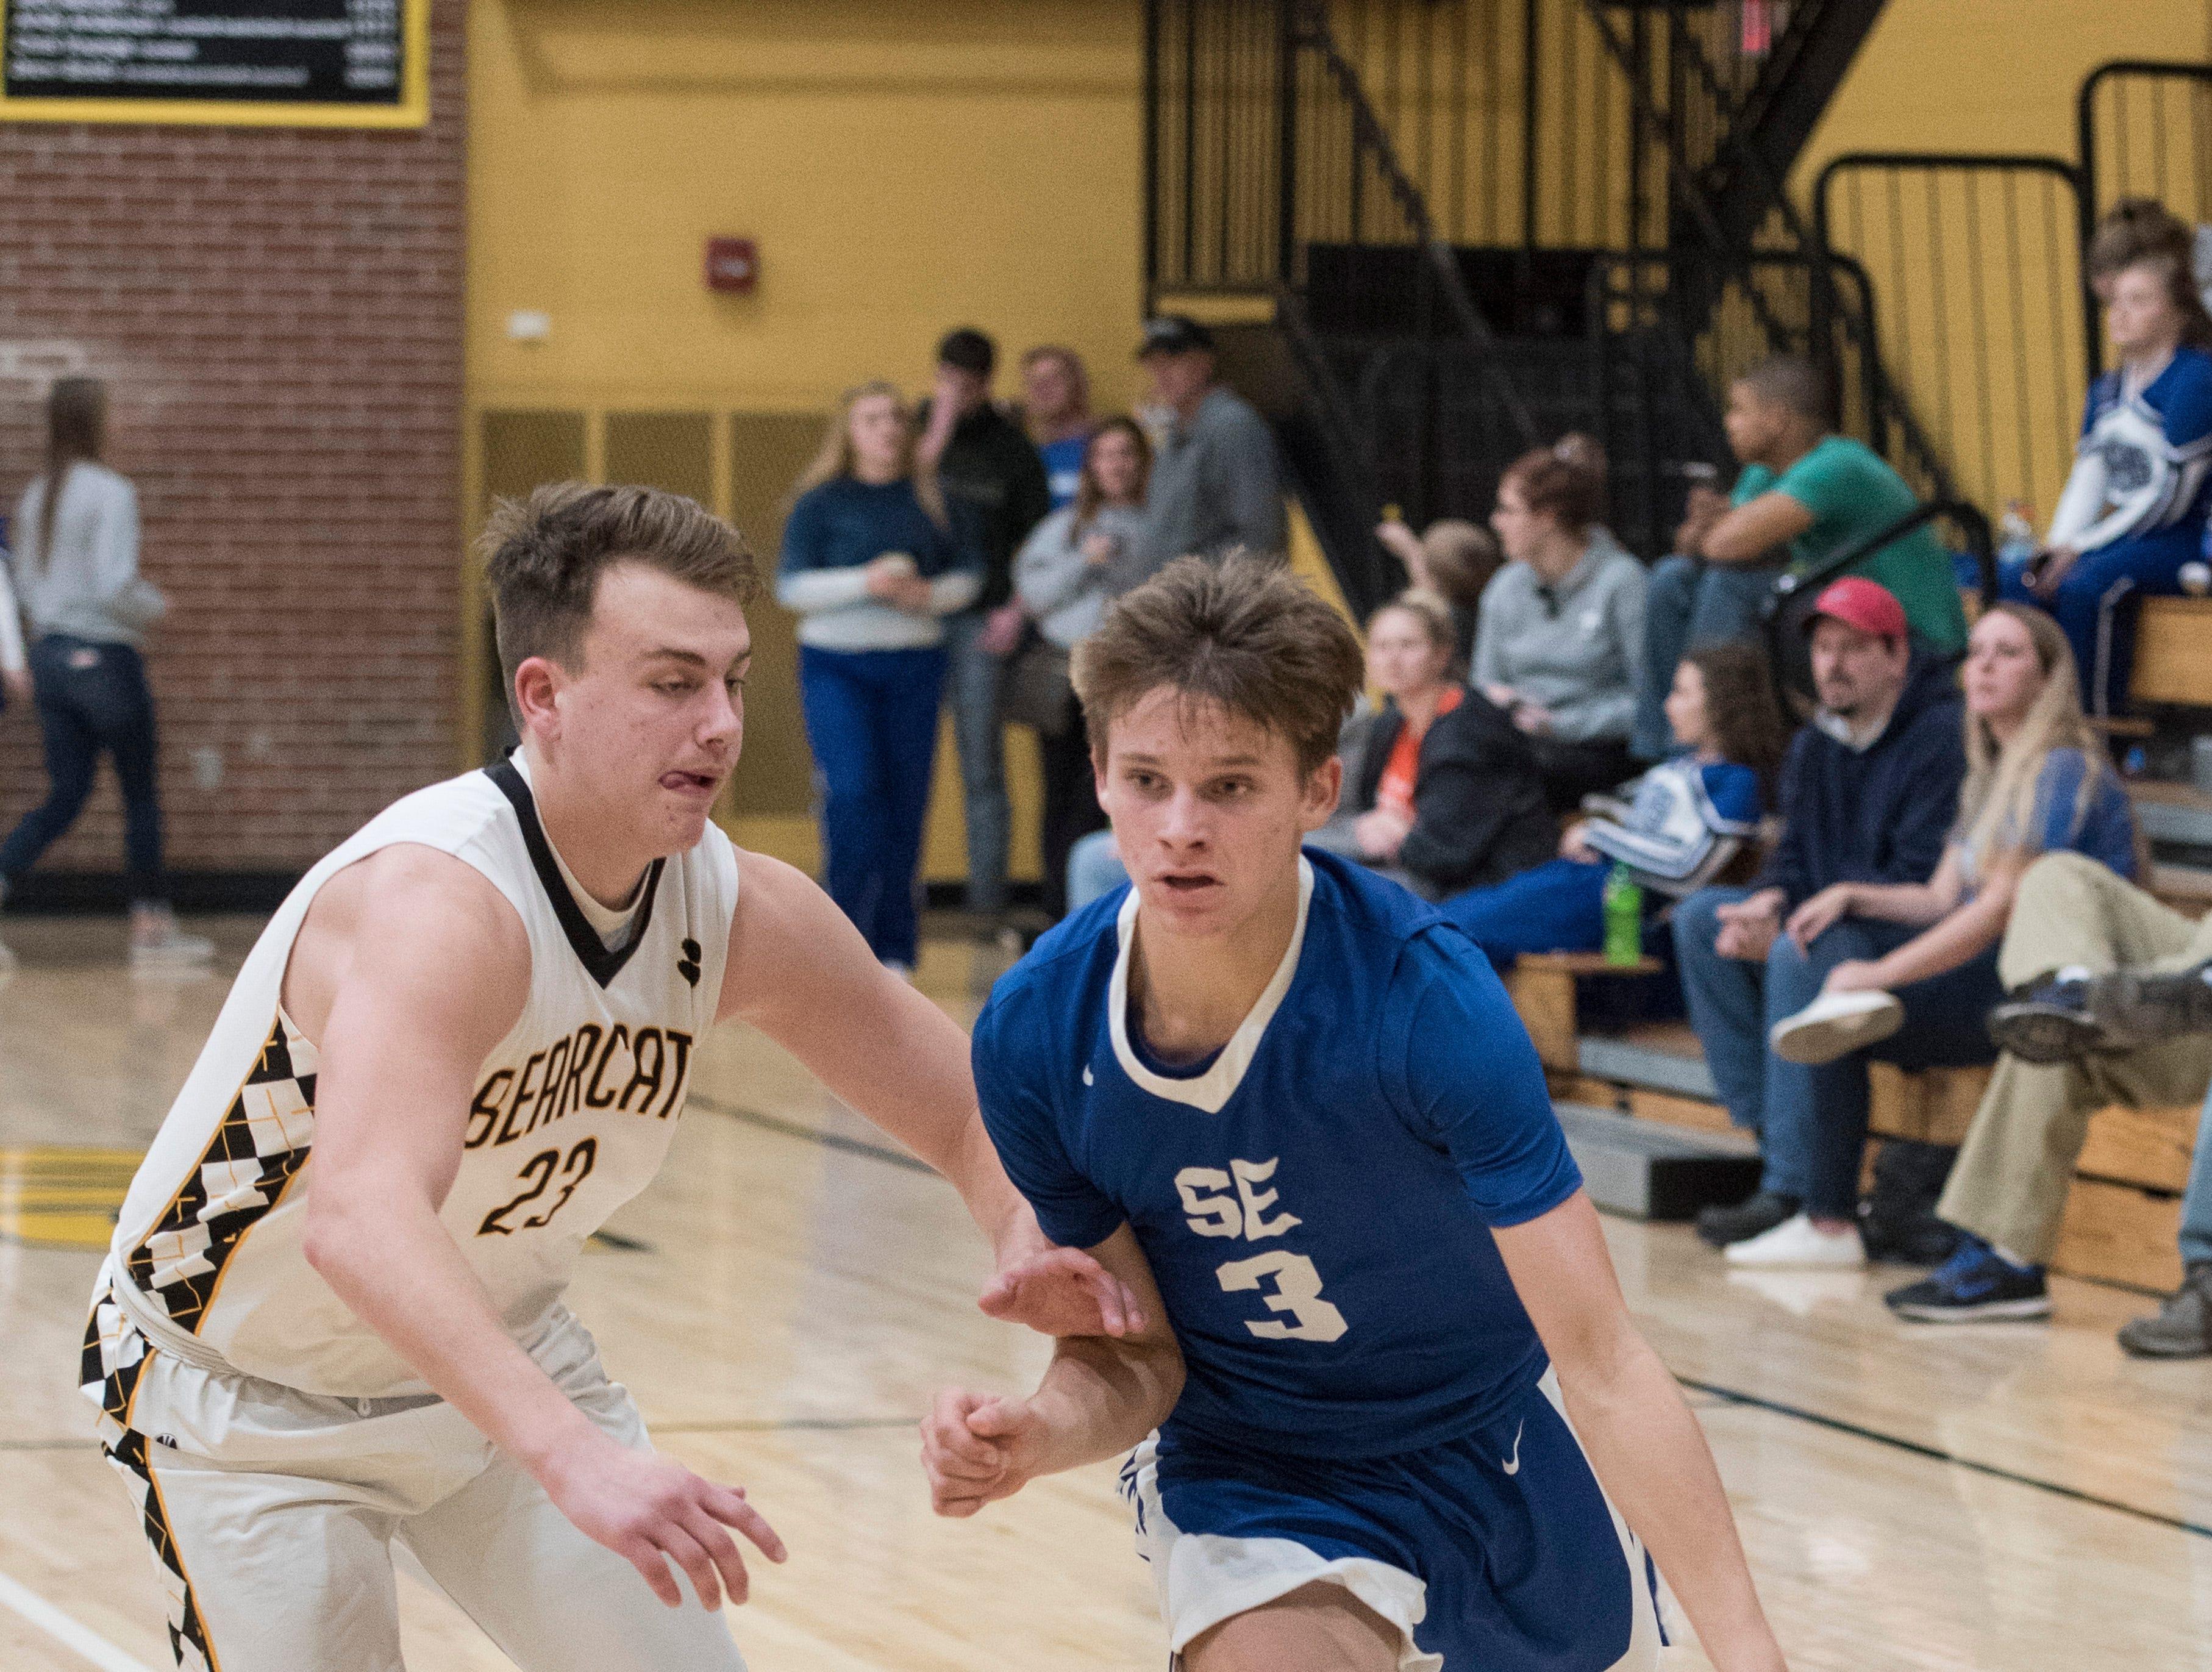 Paint Valley defeated Southeastern 60-55 Friday night at Paint Valley High School in Bainbridge, Ohio.